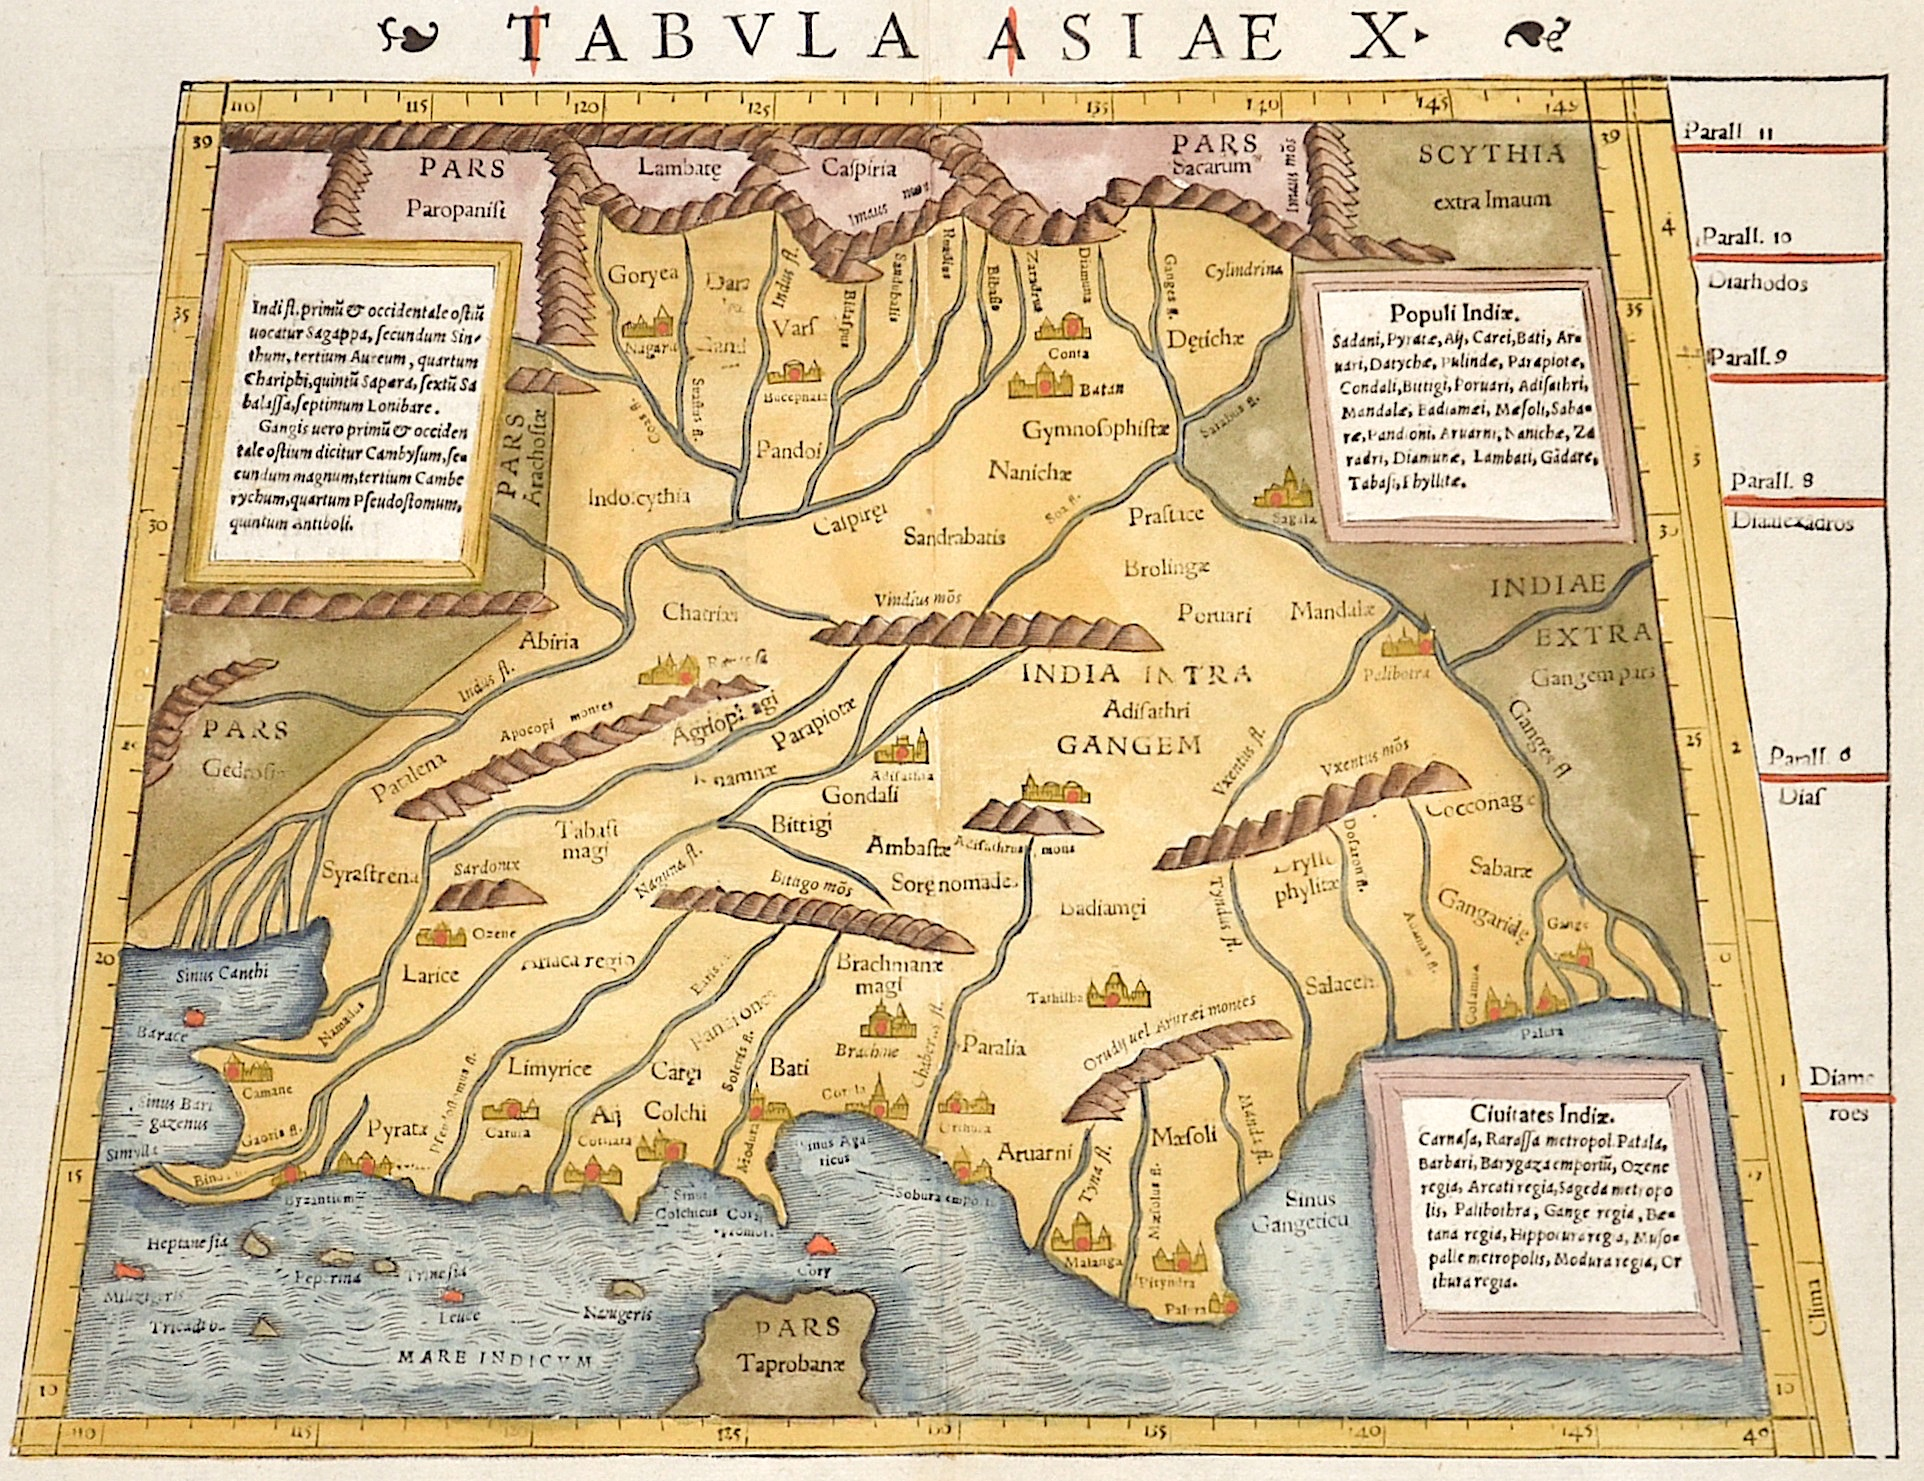 Ptolemy/Münster Sebastian Claudius Tabula Asiae X